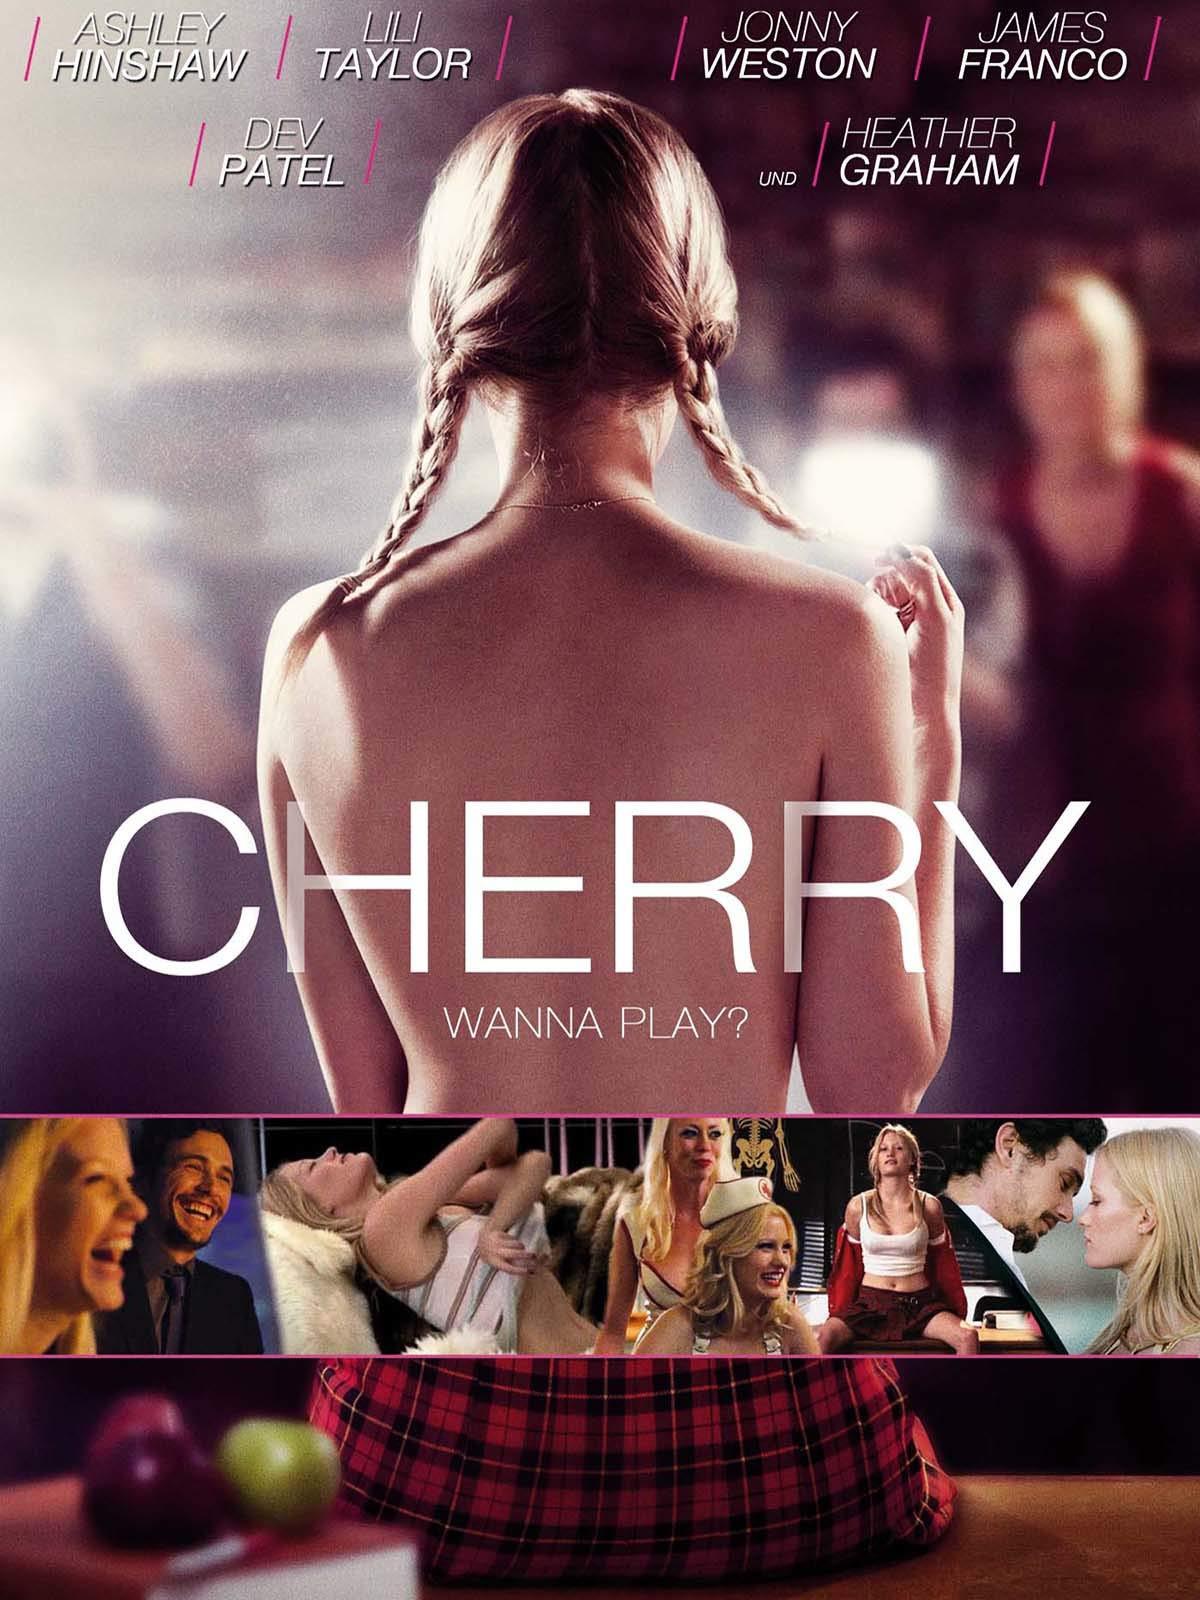 Cherry - Wanna play?